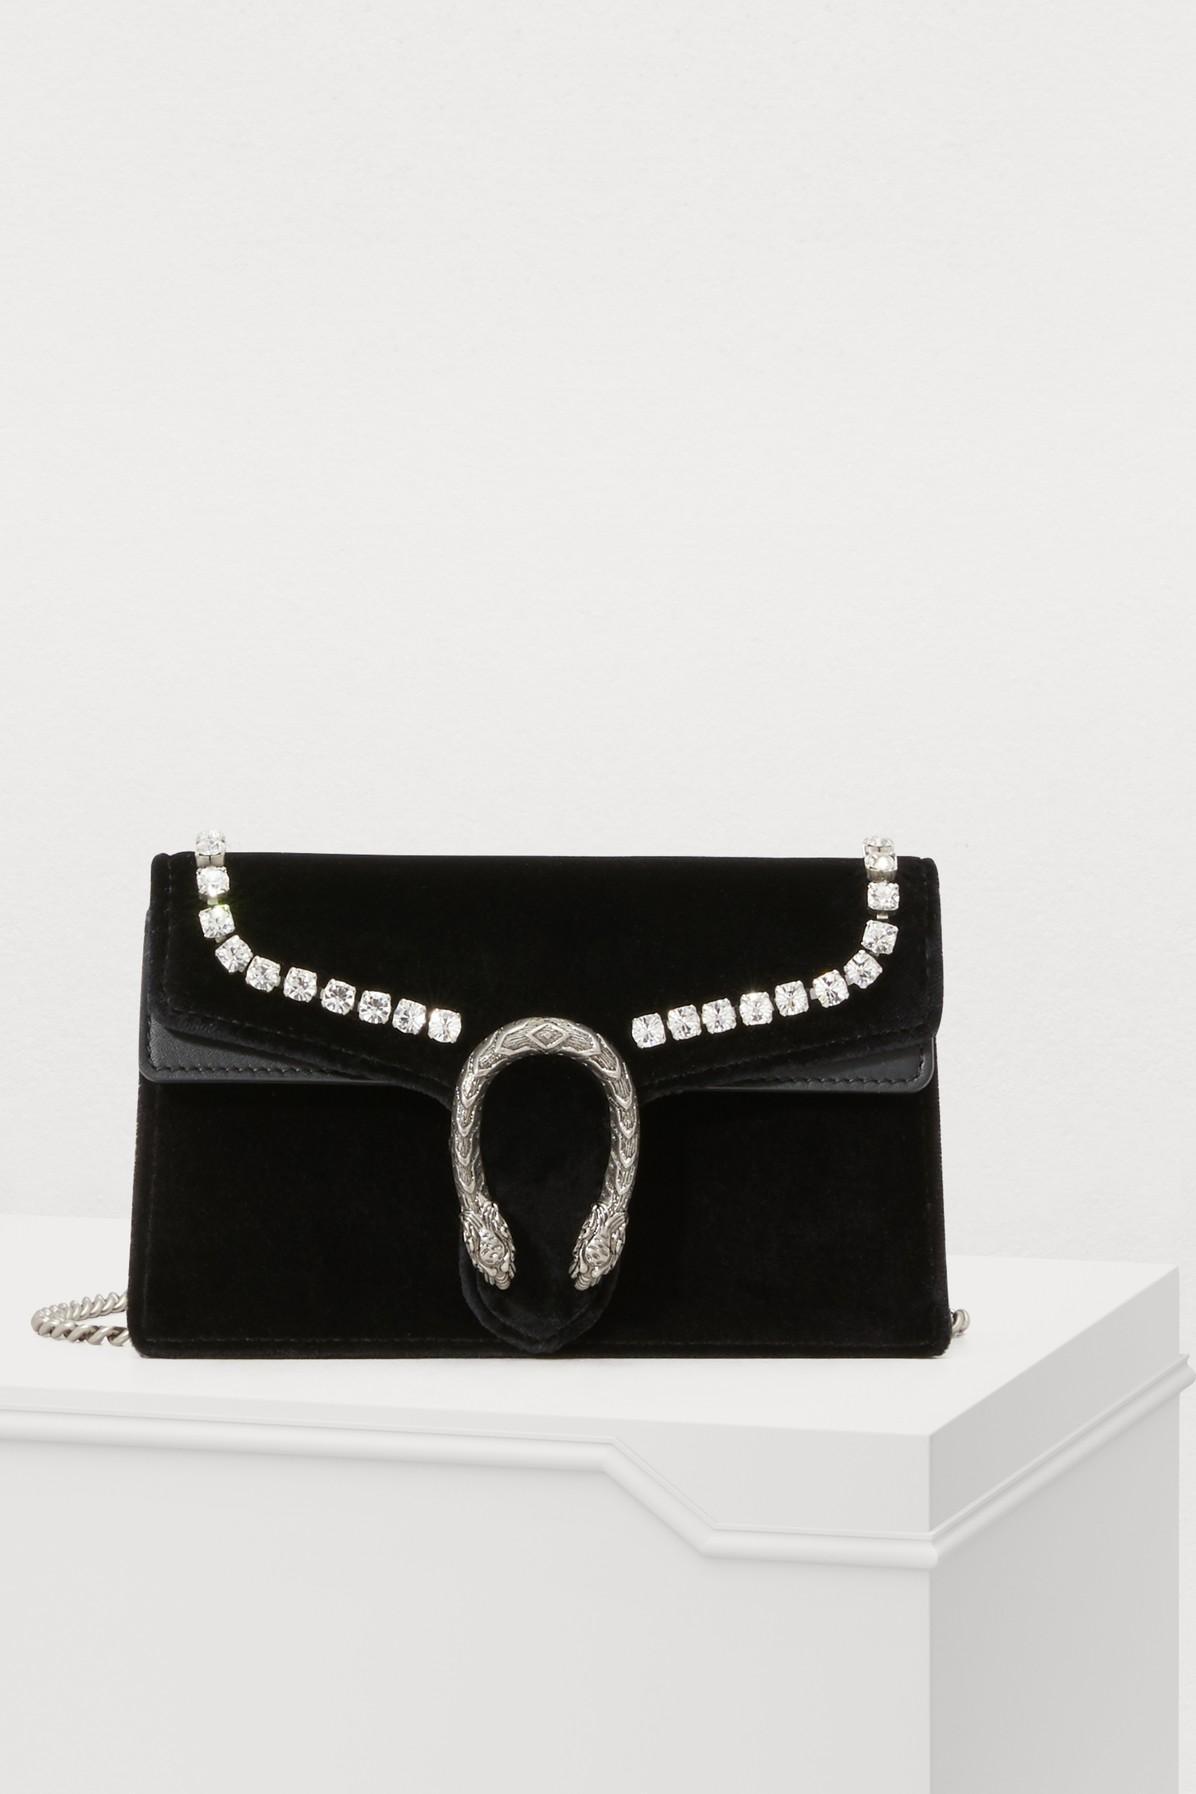 30a97fa919f Gucci - Black Dionysus Super Mini Bag - Lyst. View fullscreen